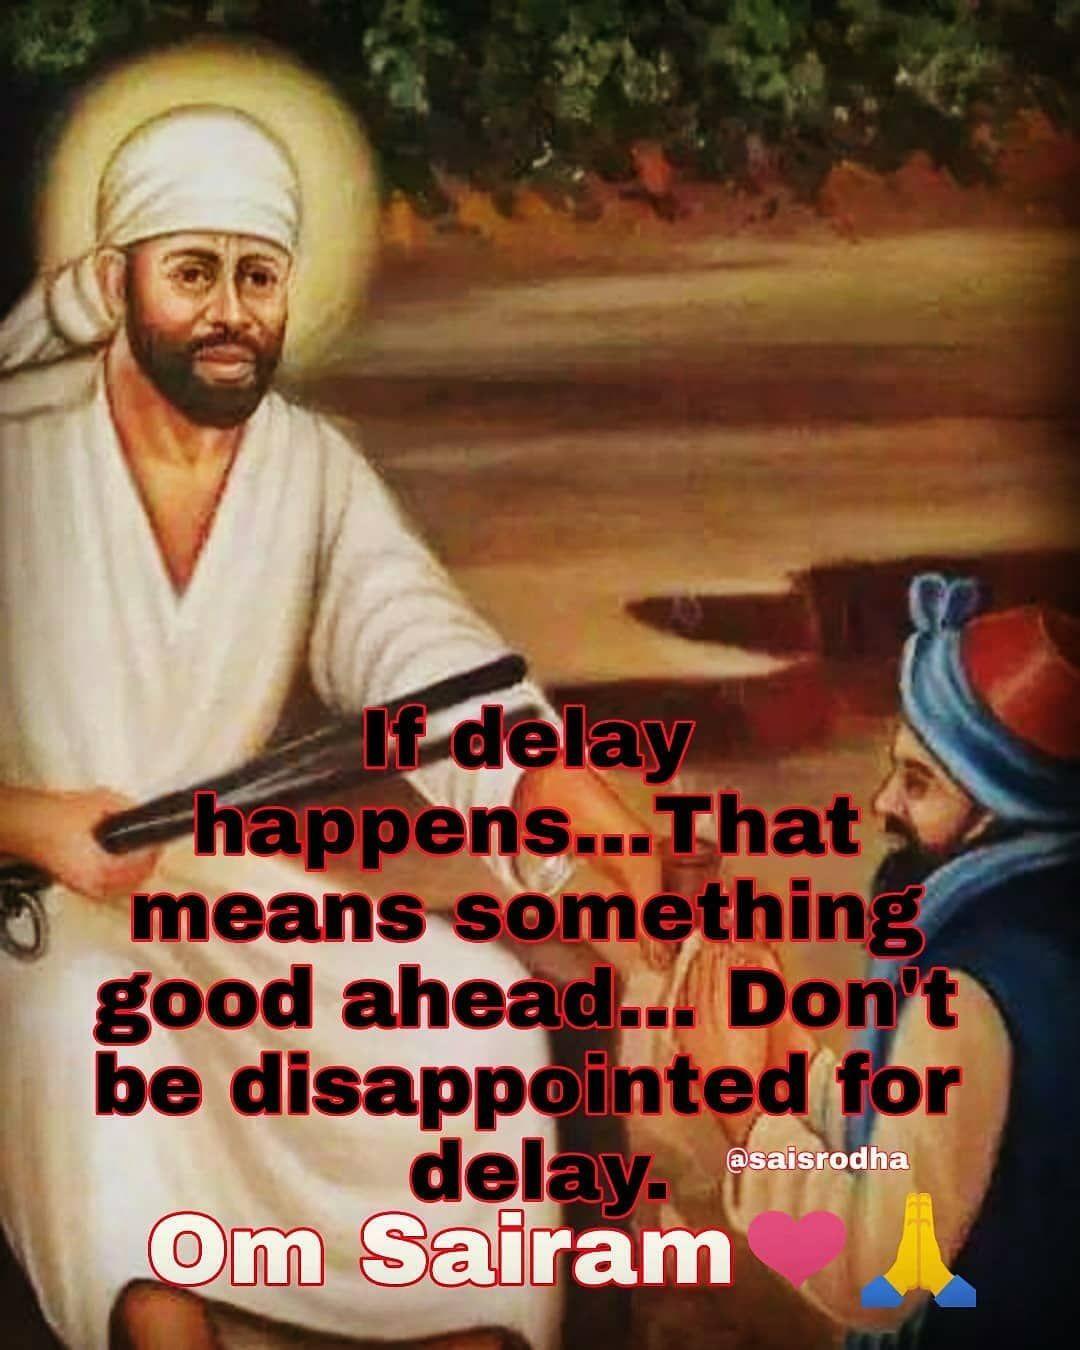 Reposted From Saisrodha Get Regrann Mere Sai Saiblessings Saimaa Shirdiwalesaibaba Shirdi Saidarsh Sai Baba Quotes Divine Quotes Sathya Sai Baba